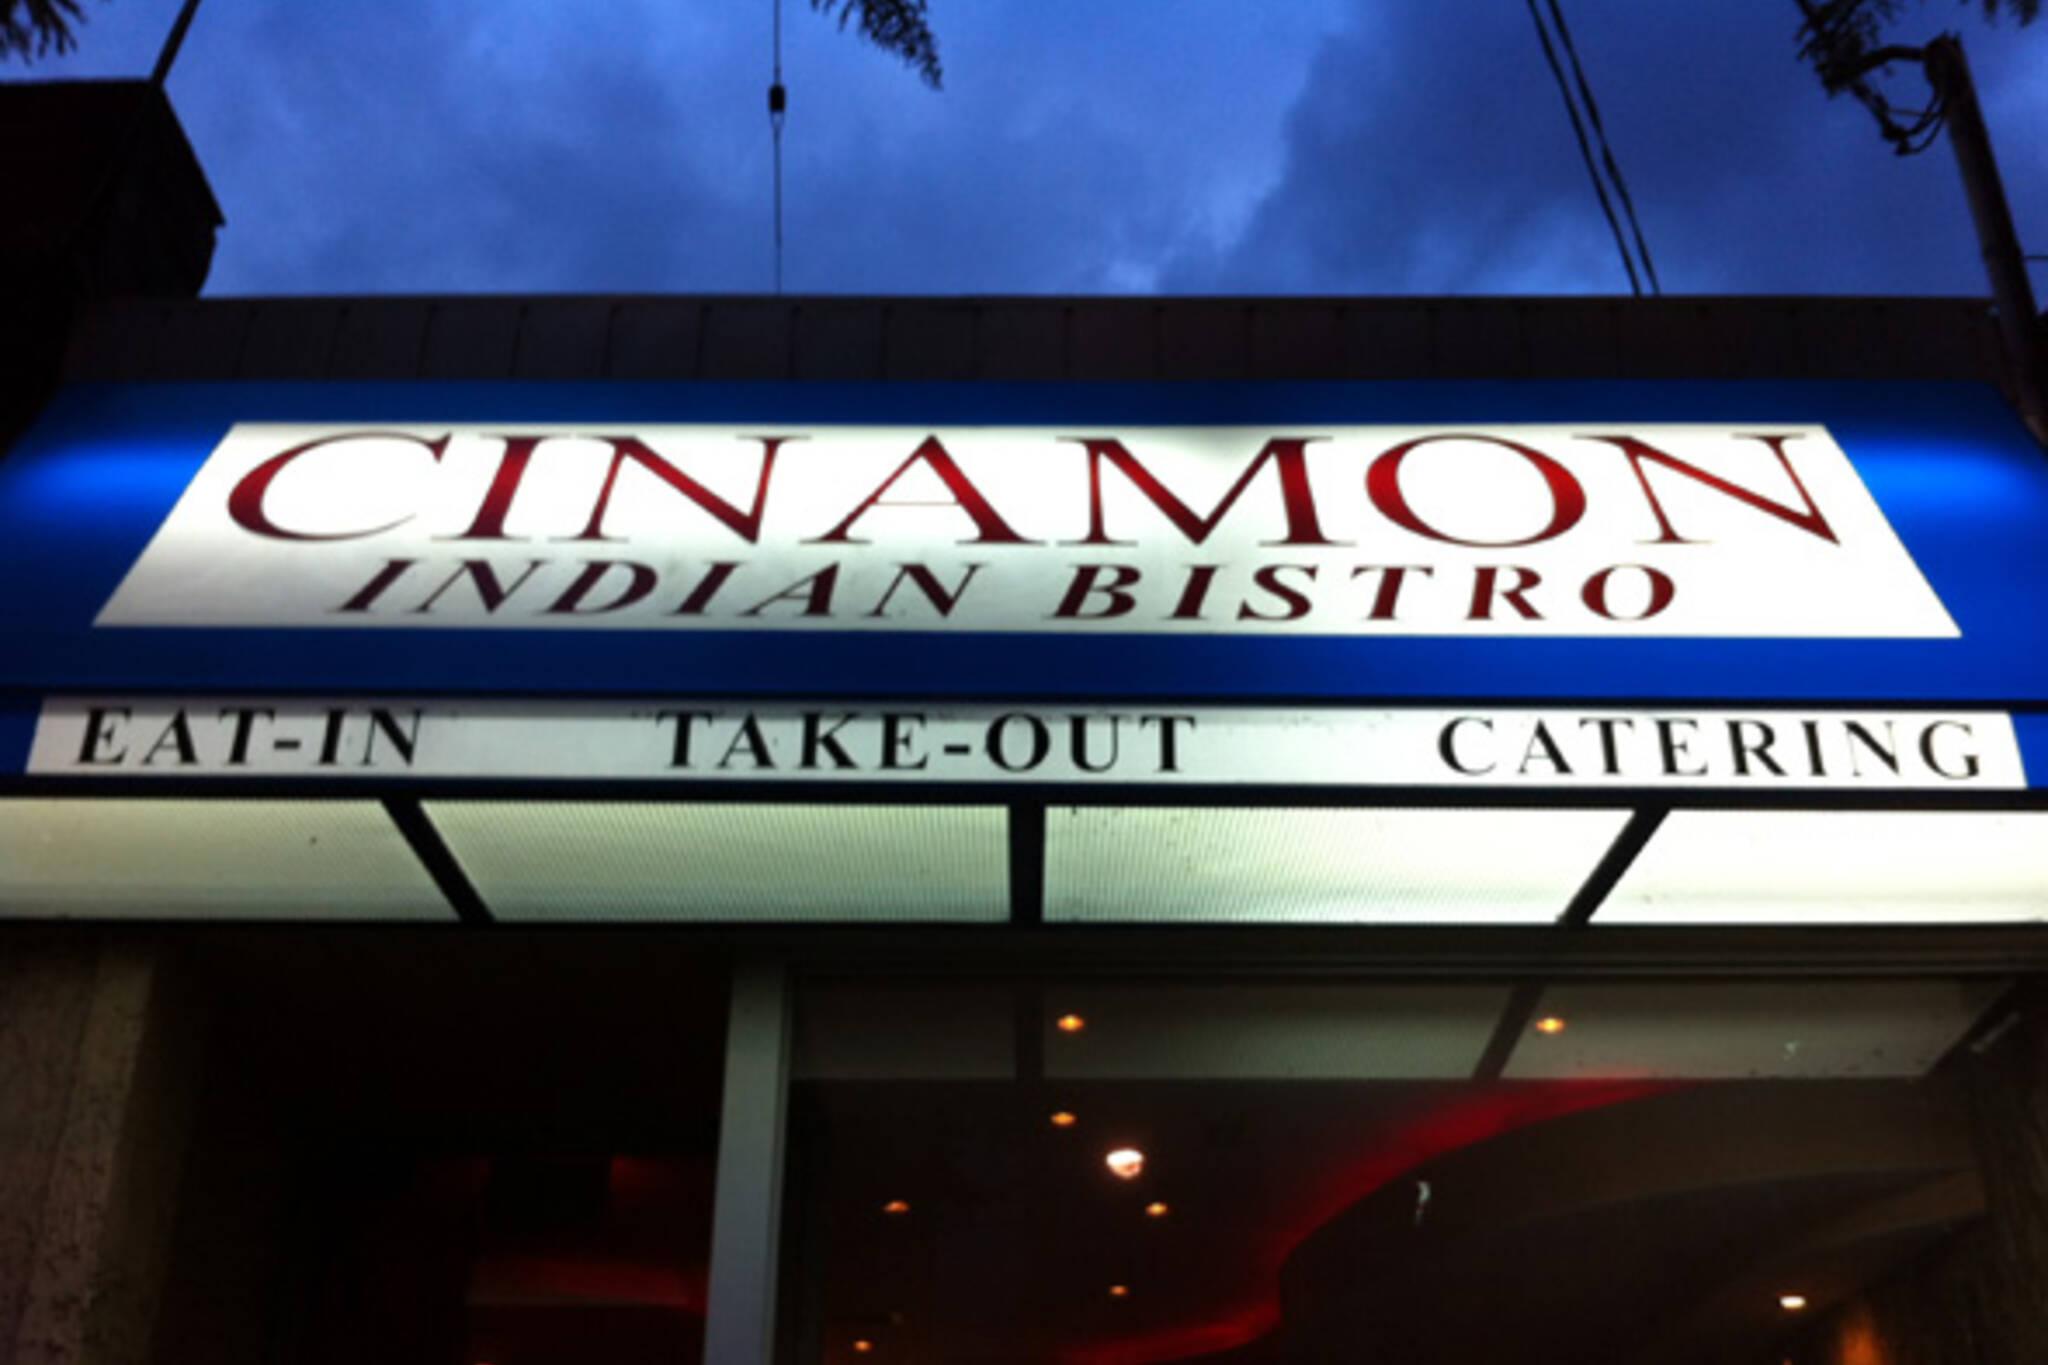 Cinamon Indian Bistro